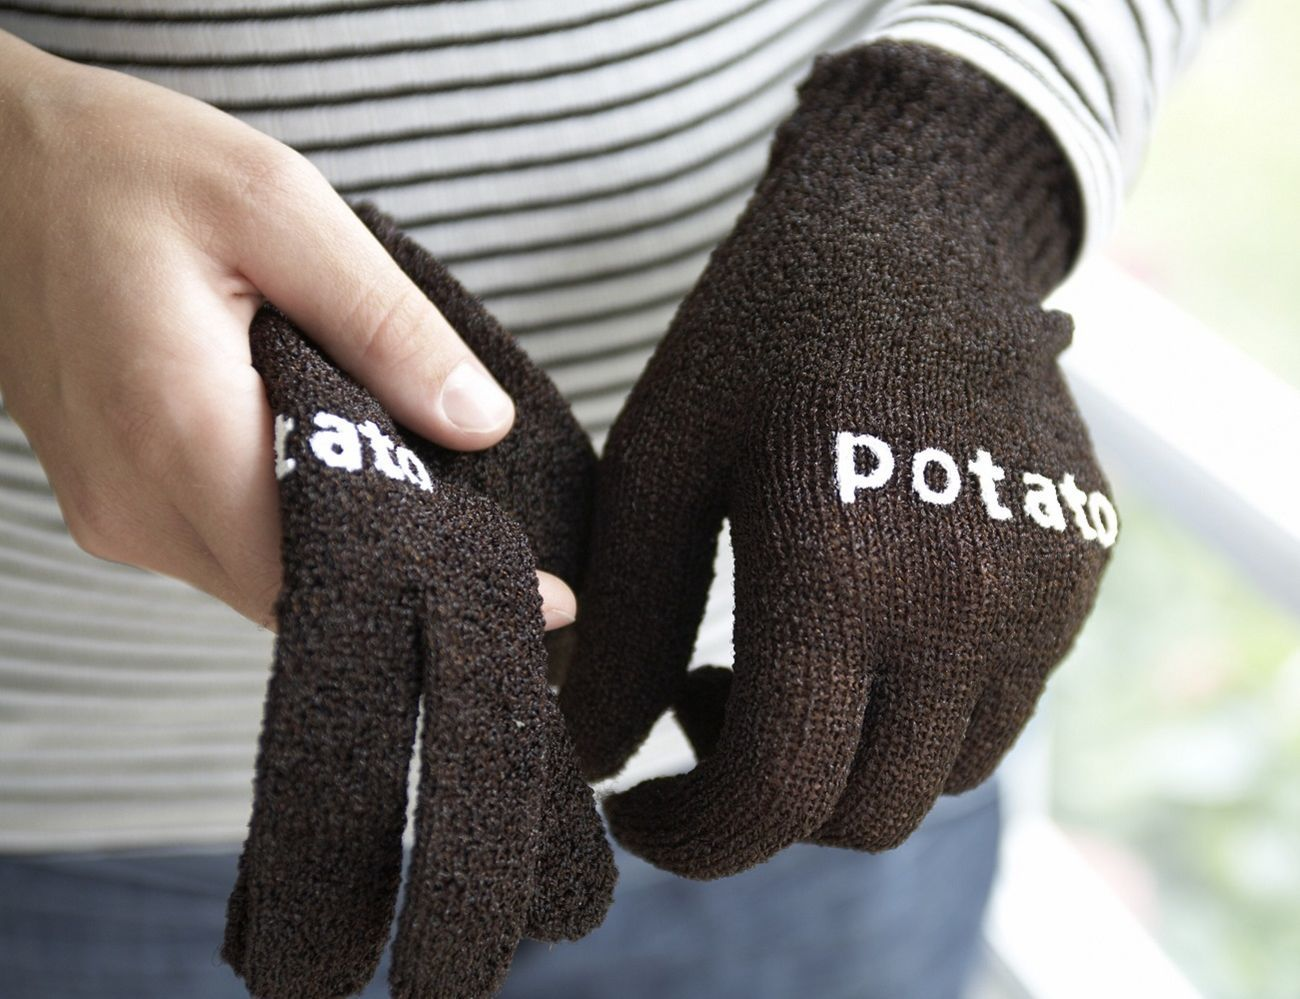 Skrub'a Veggie Gloves